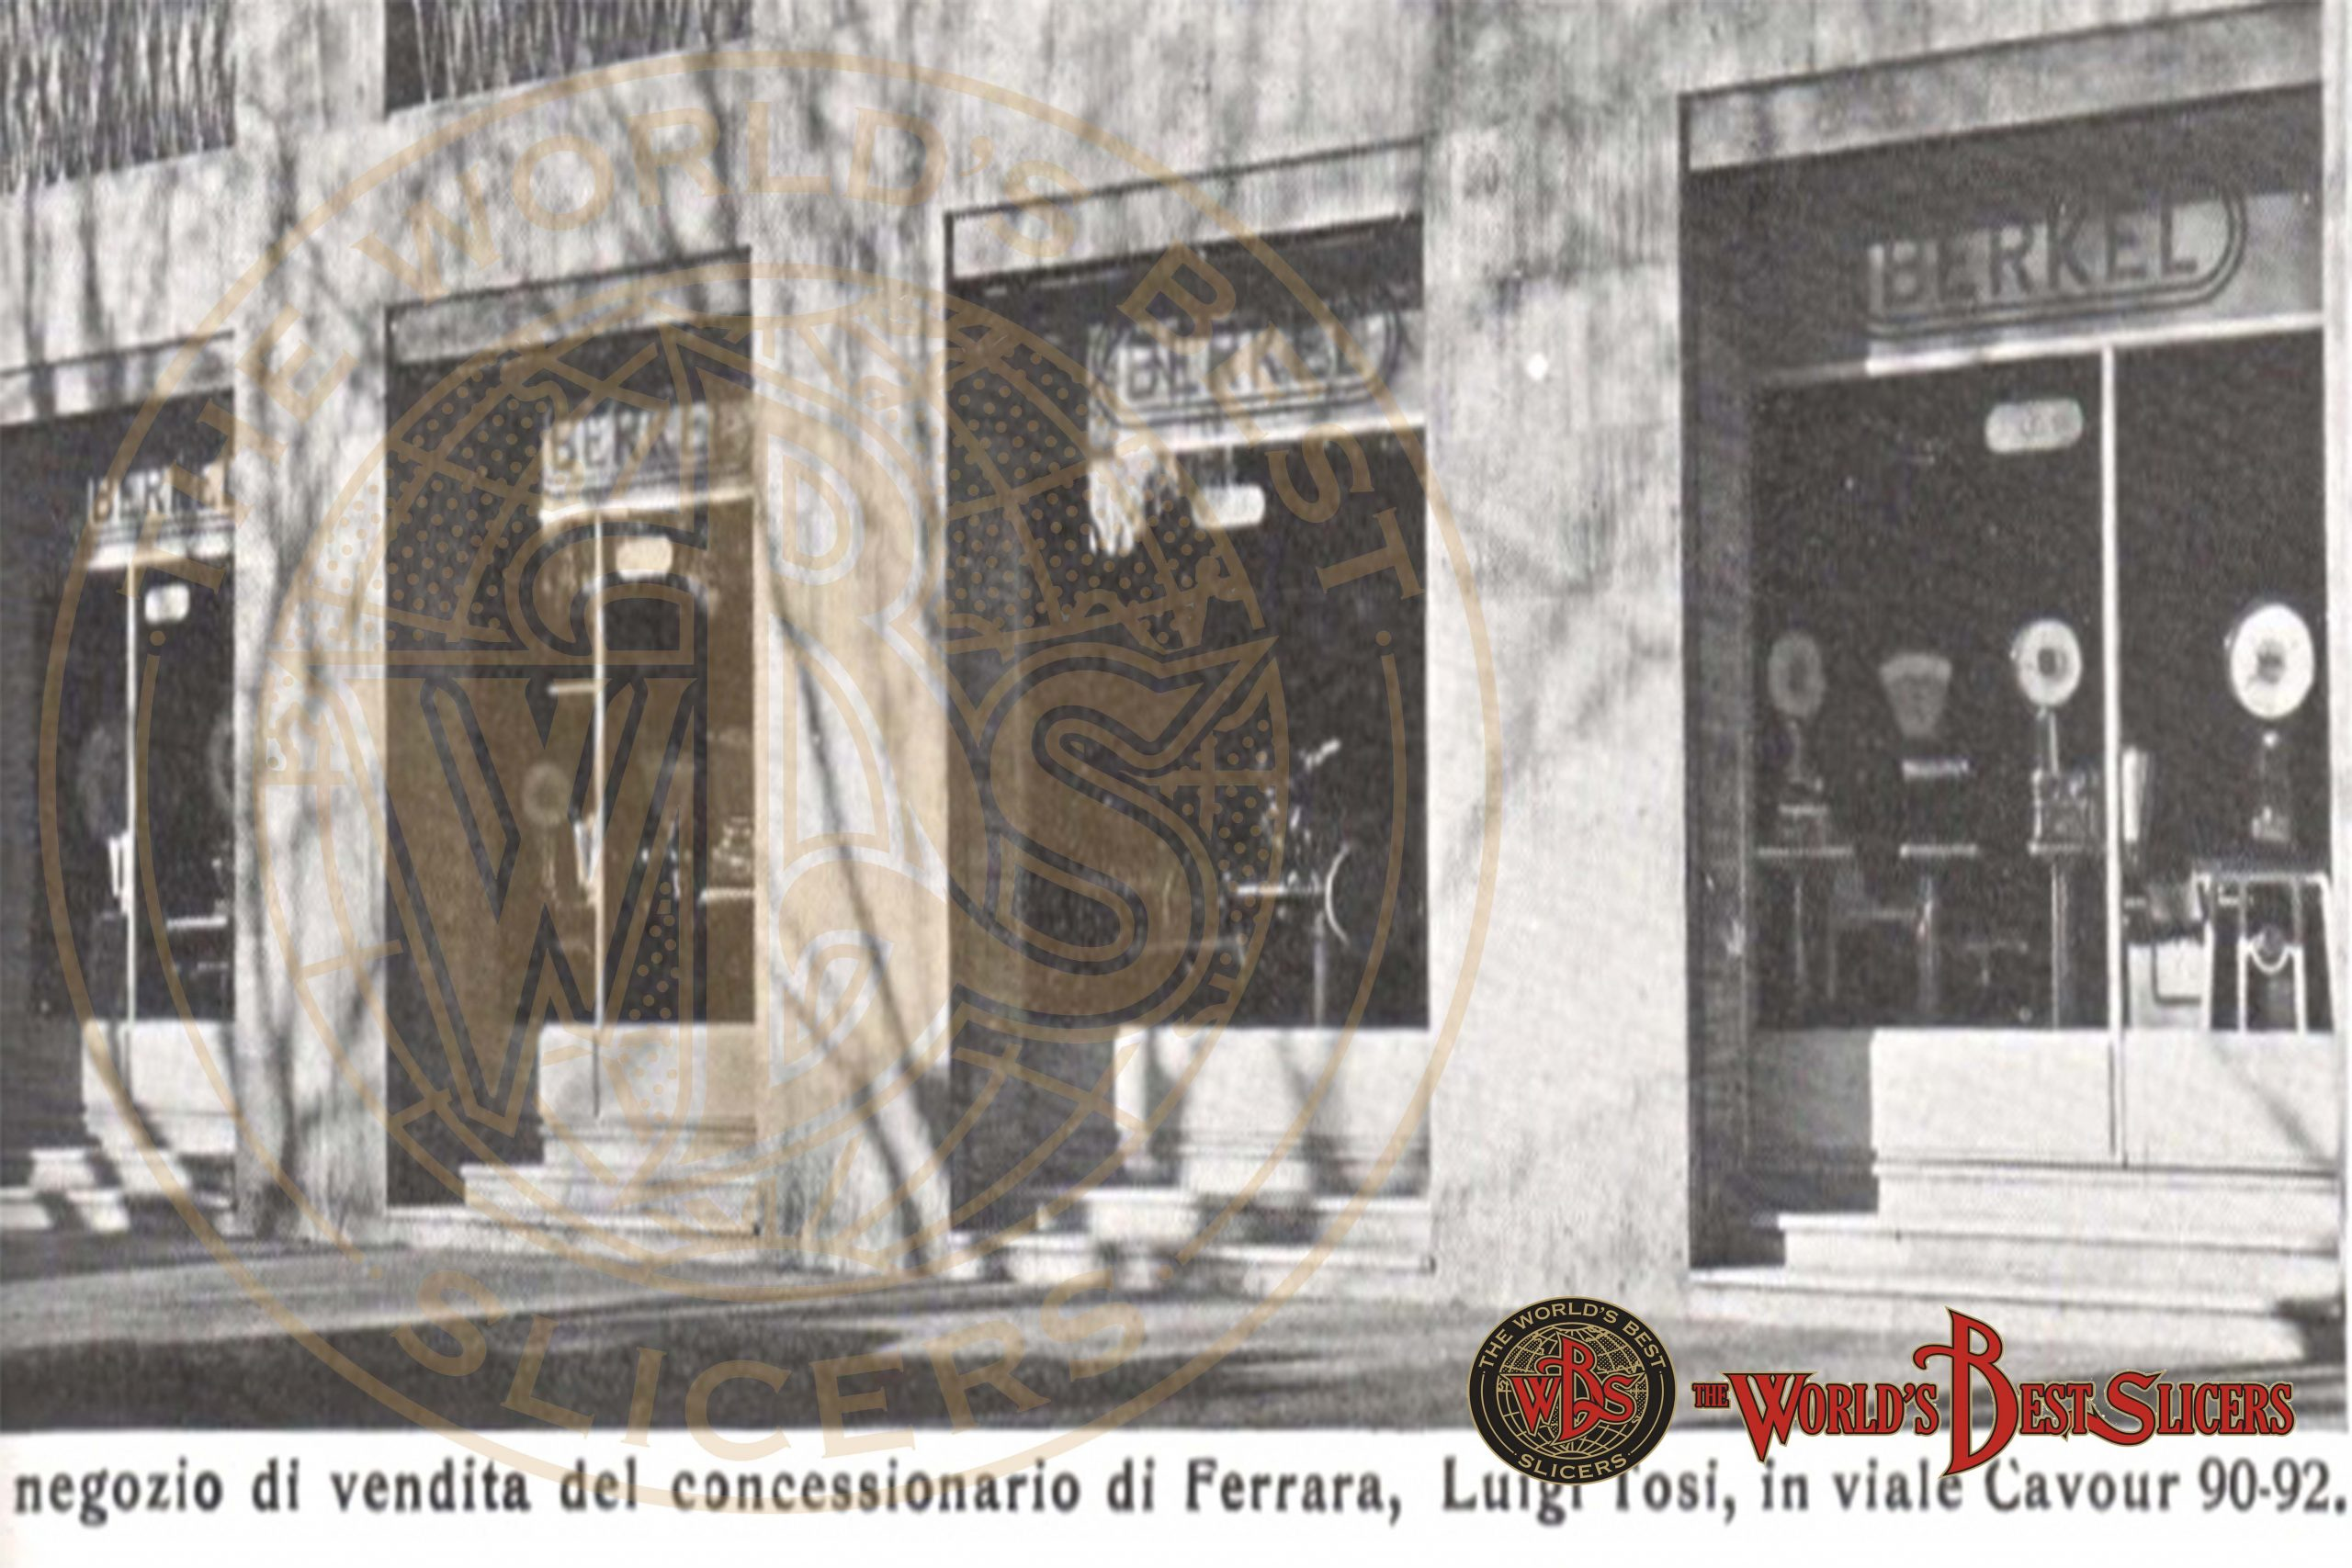 Ferrara-scaled W.A.Van Berkel's Geschichte